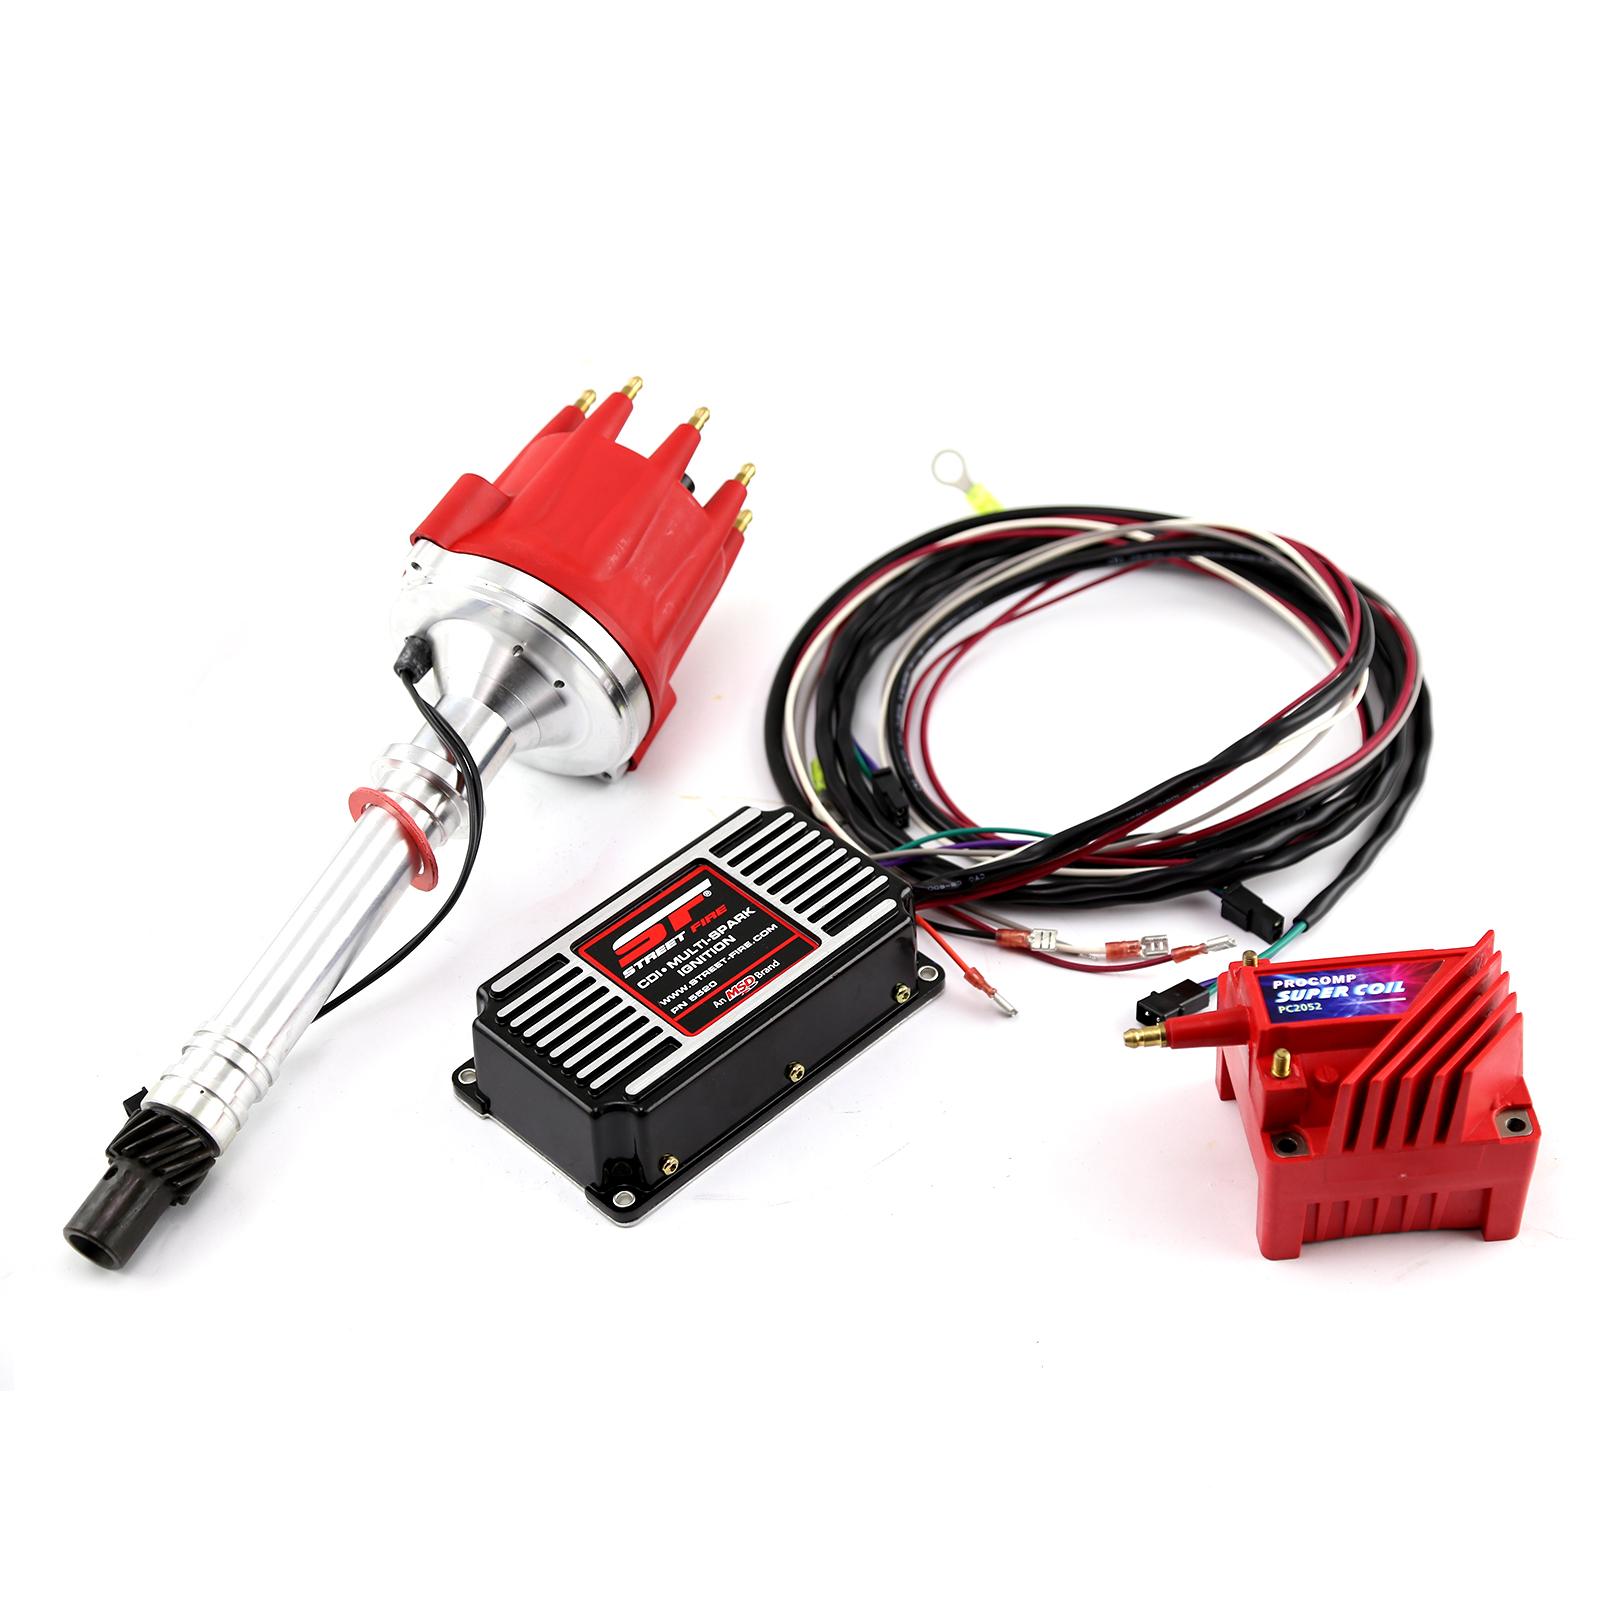 Chevy SBC 350 BBC 454 Pro Billet Distributor MSD CDI 5520 Ignition & Coil Kit